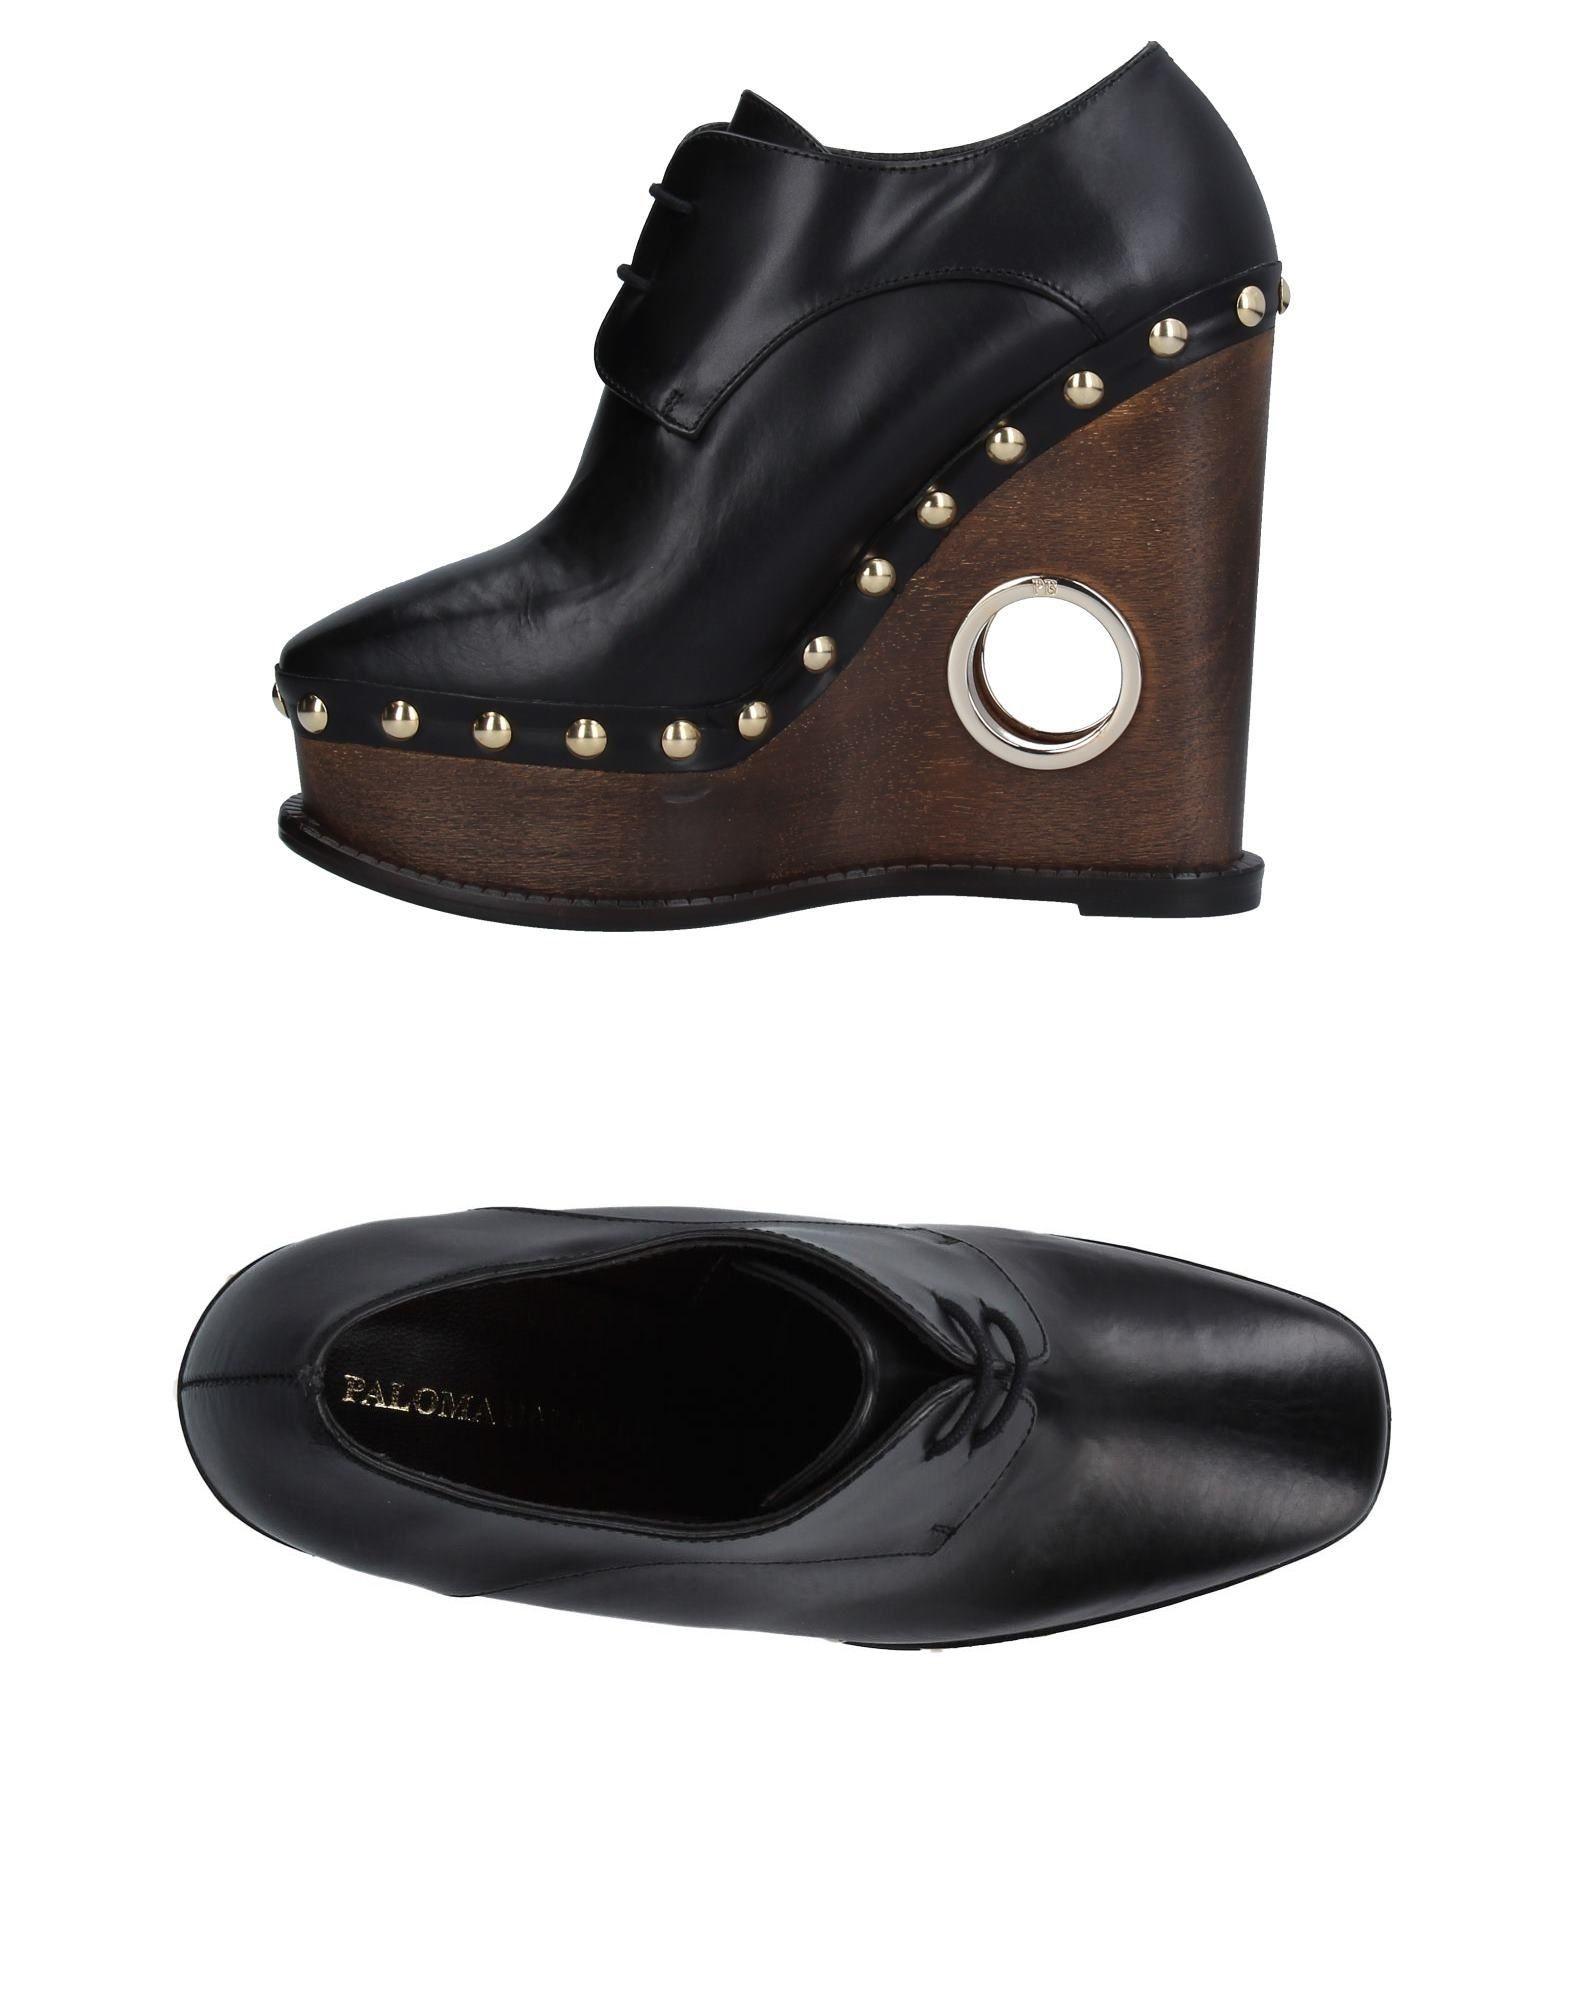 Paloma Barceló Schnürschuhe Damen  11224525UD Gute Qualität beliebte Schuhe